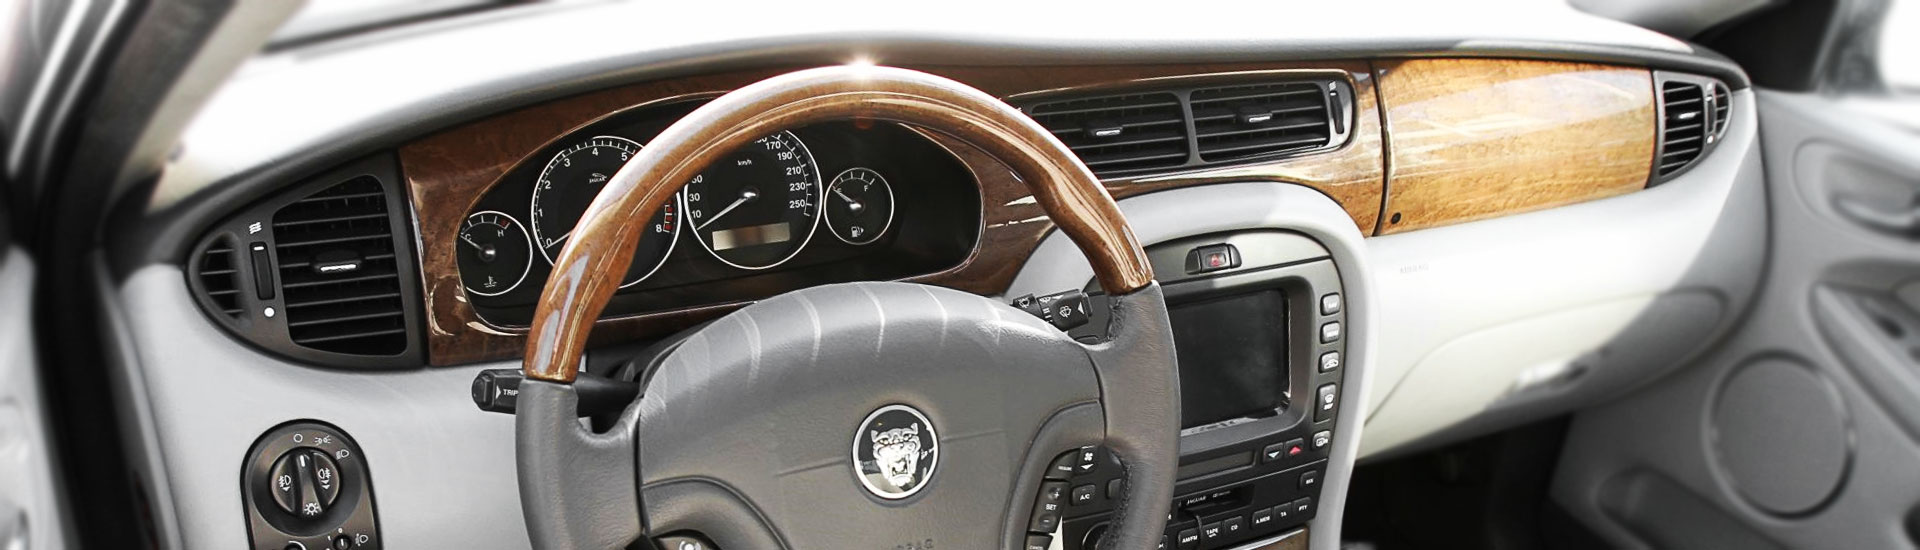 Jaguar X Type Dash Kits Custom Jaguar X Type Dash Kit